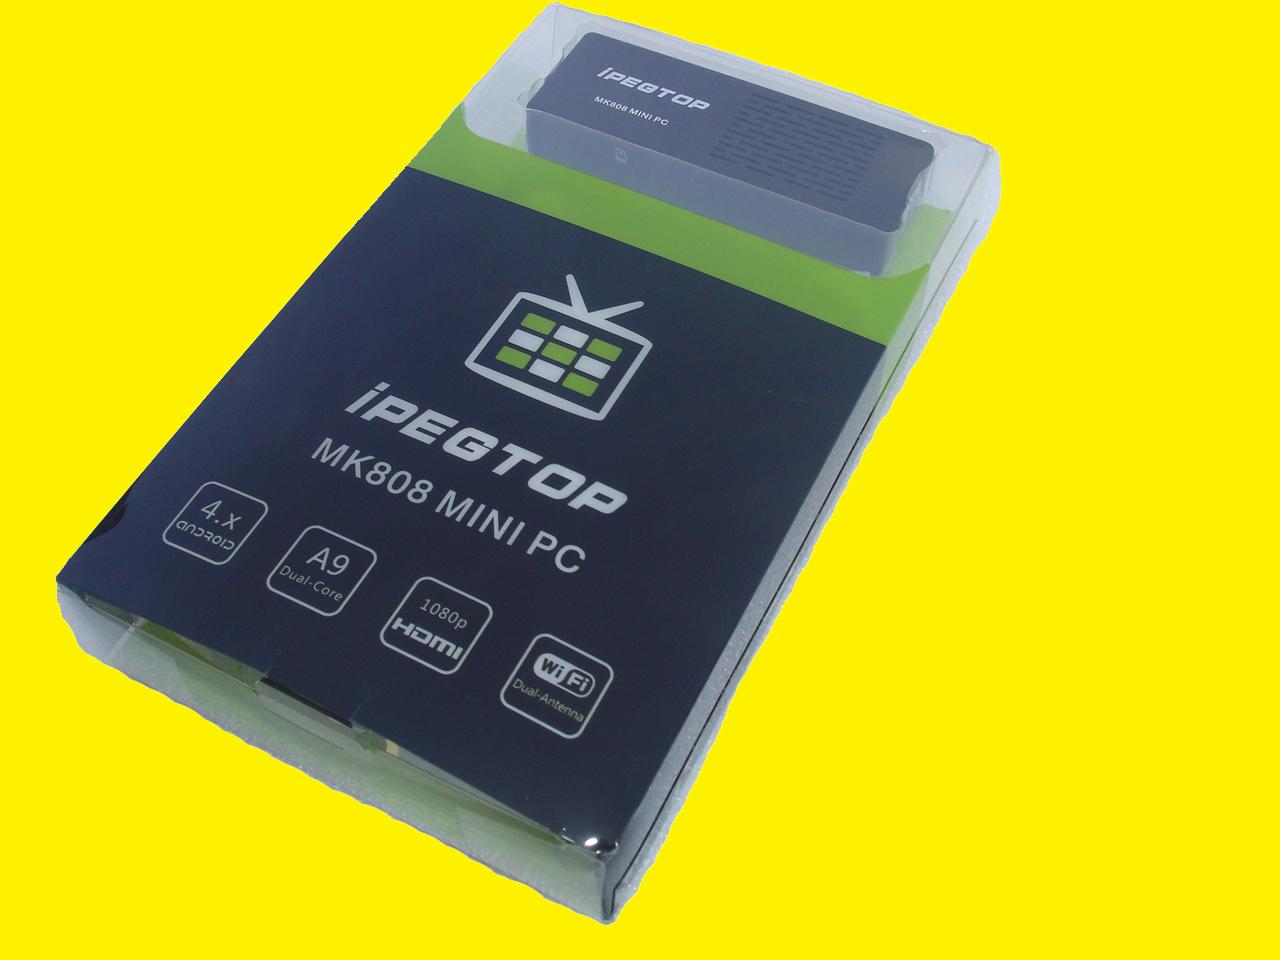 MK808 Android 4 1 1 mini pc Jelly Bean Smart TV Dual Core